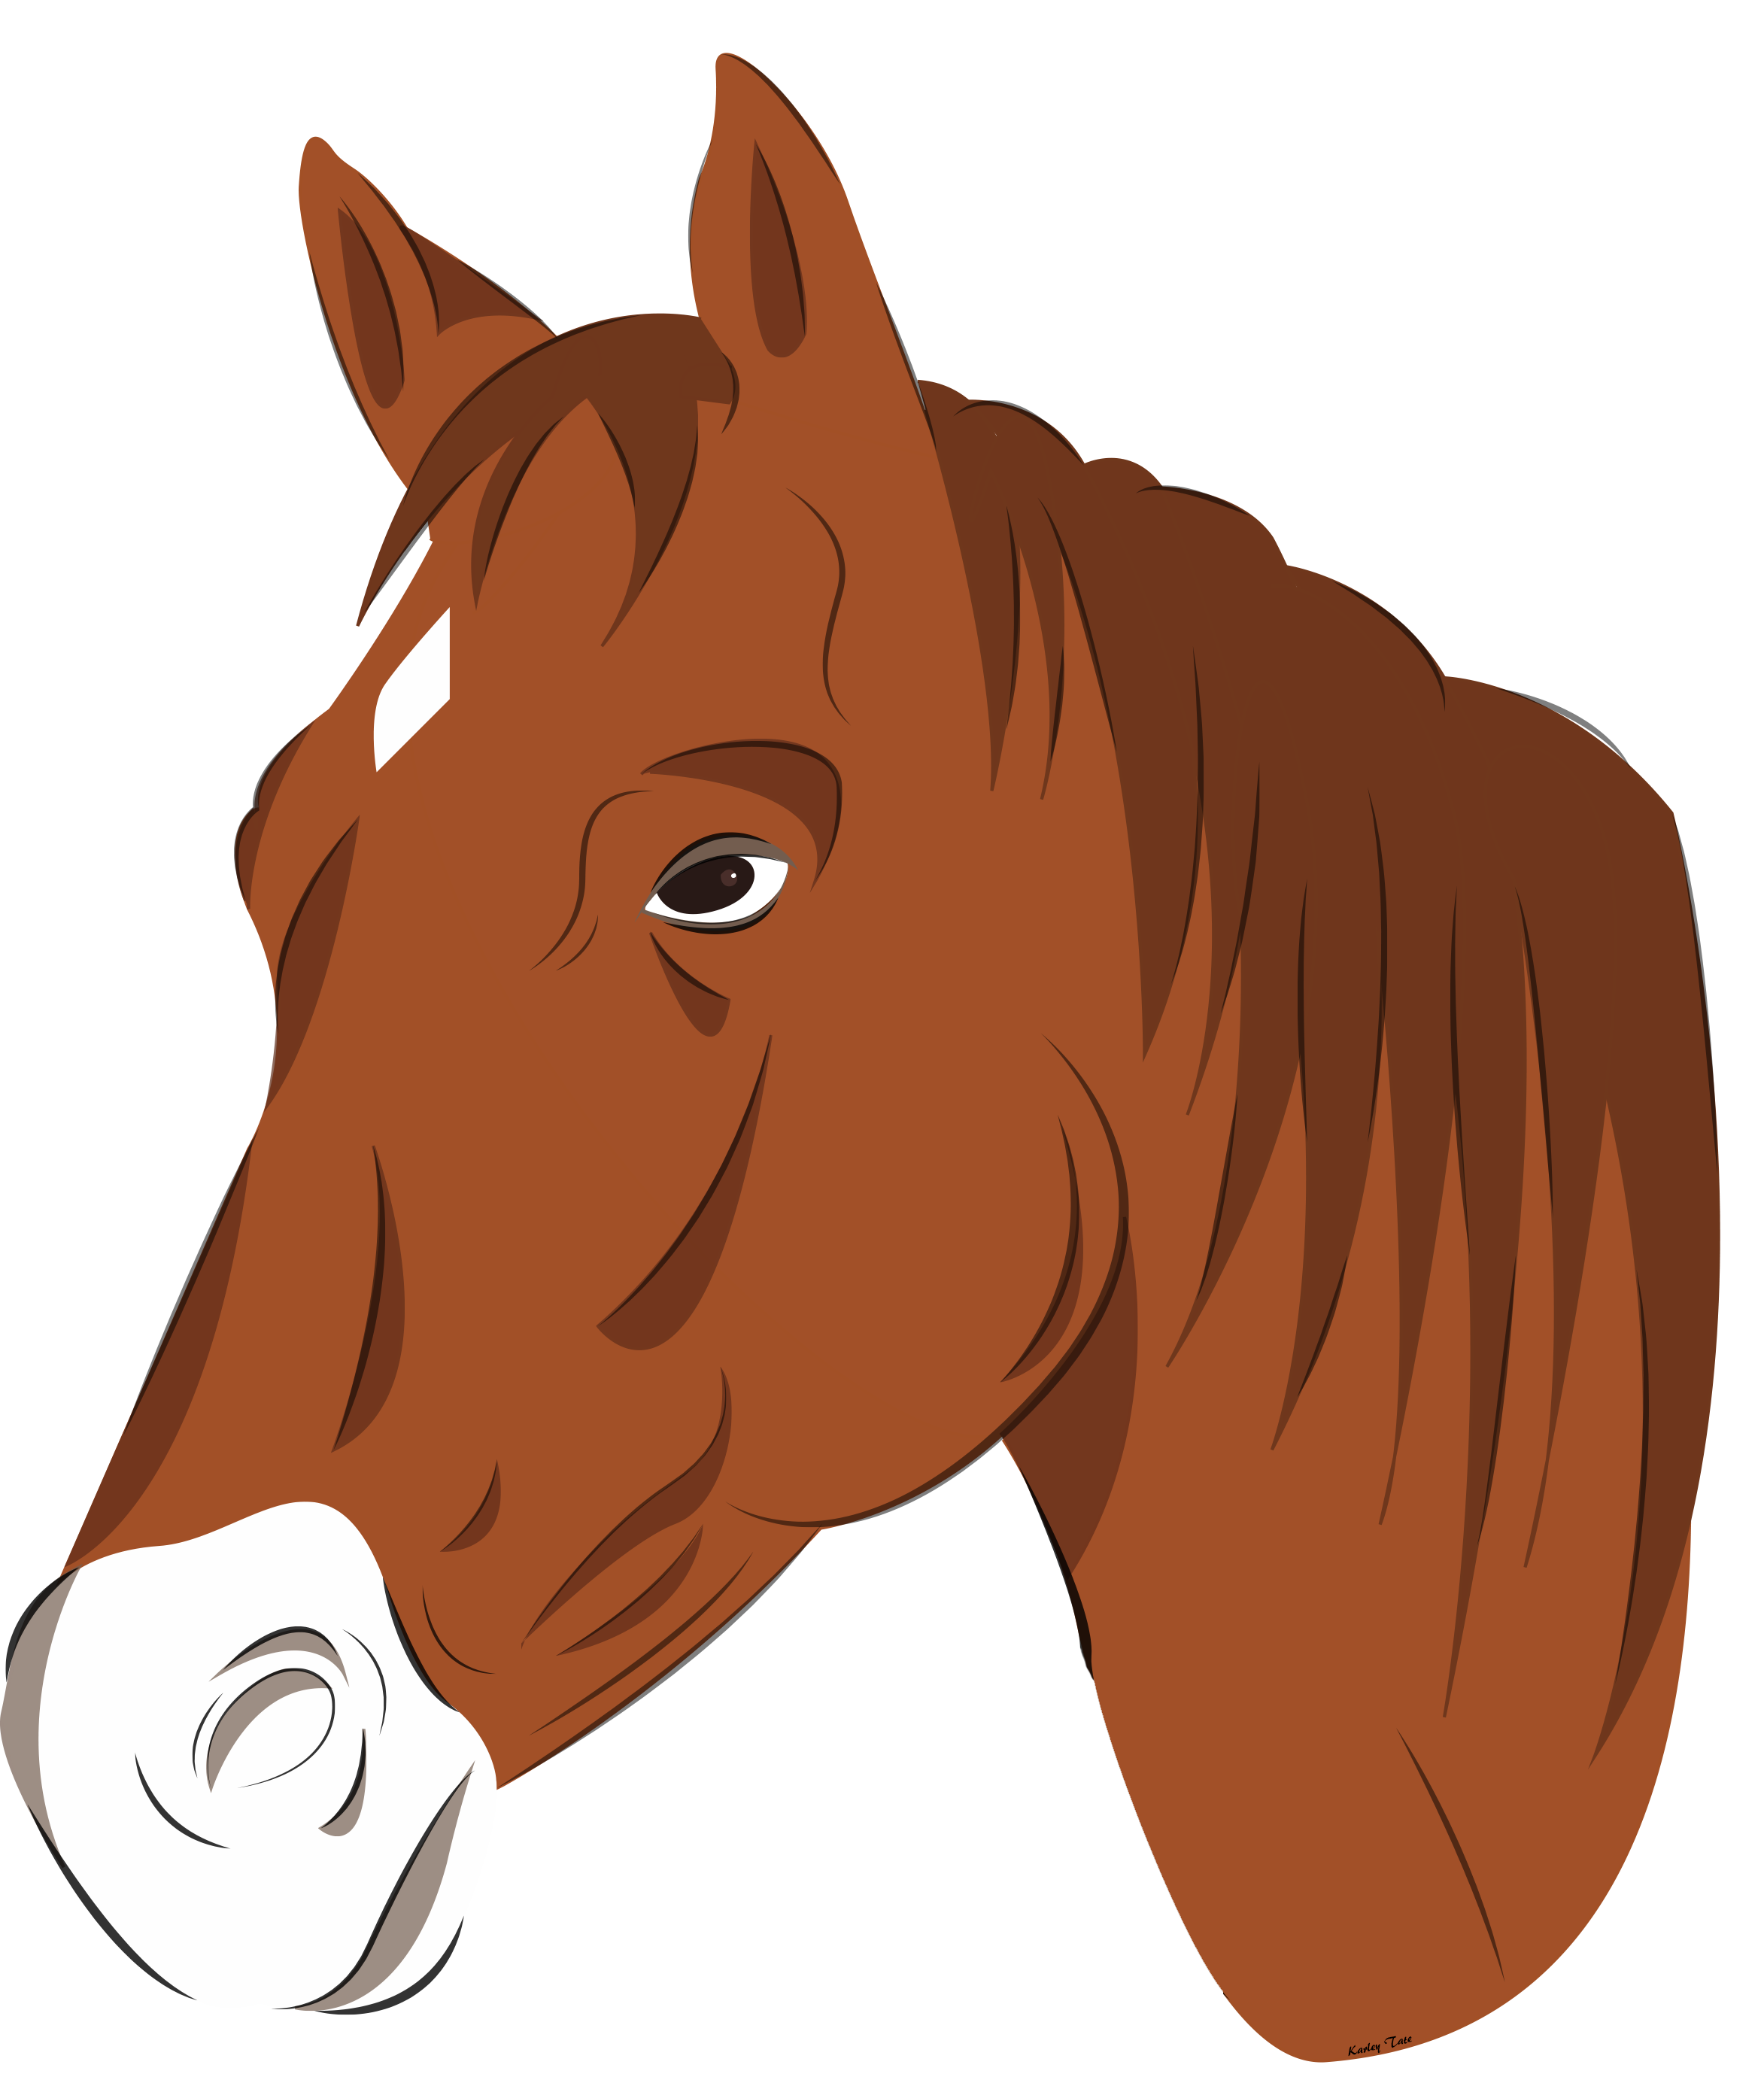 horse head vector png clipart horse head in horseshoe clip art horse head heart